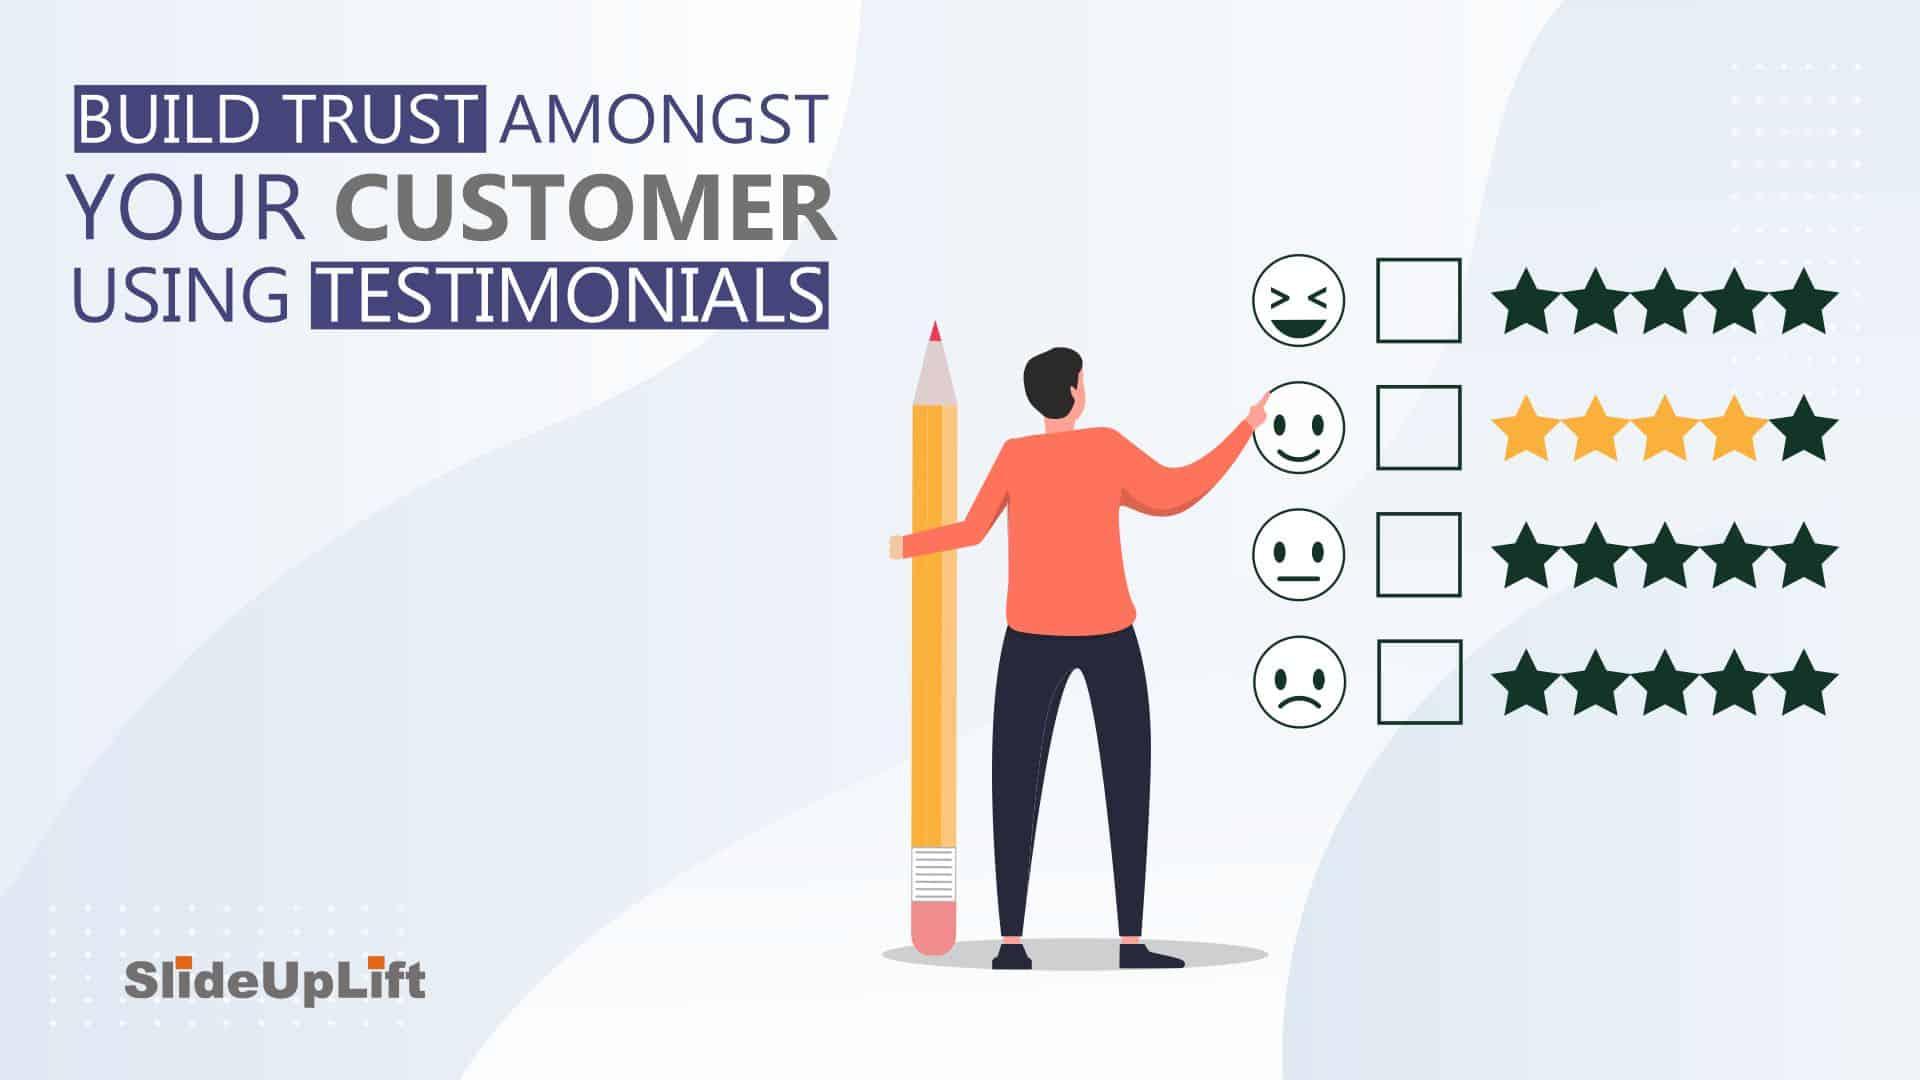 Build Trust amongst your customers Using Testimonials